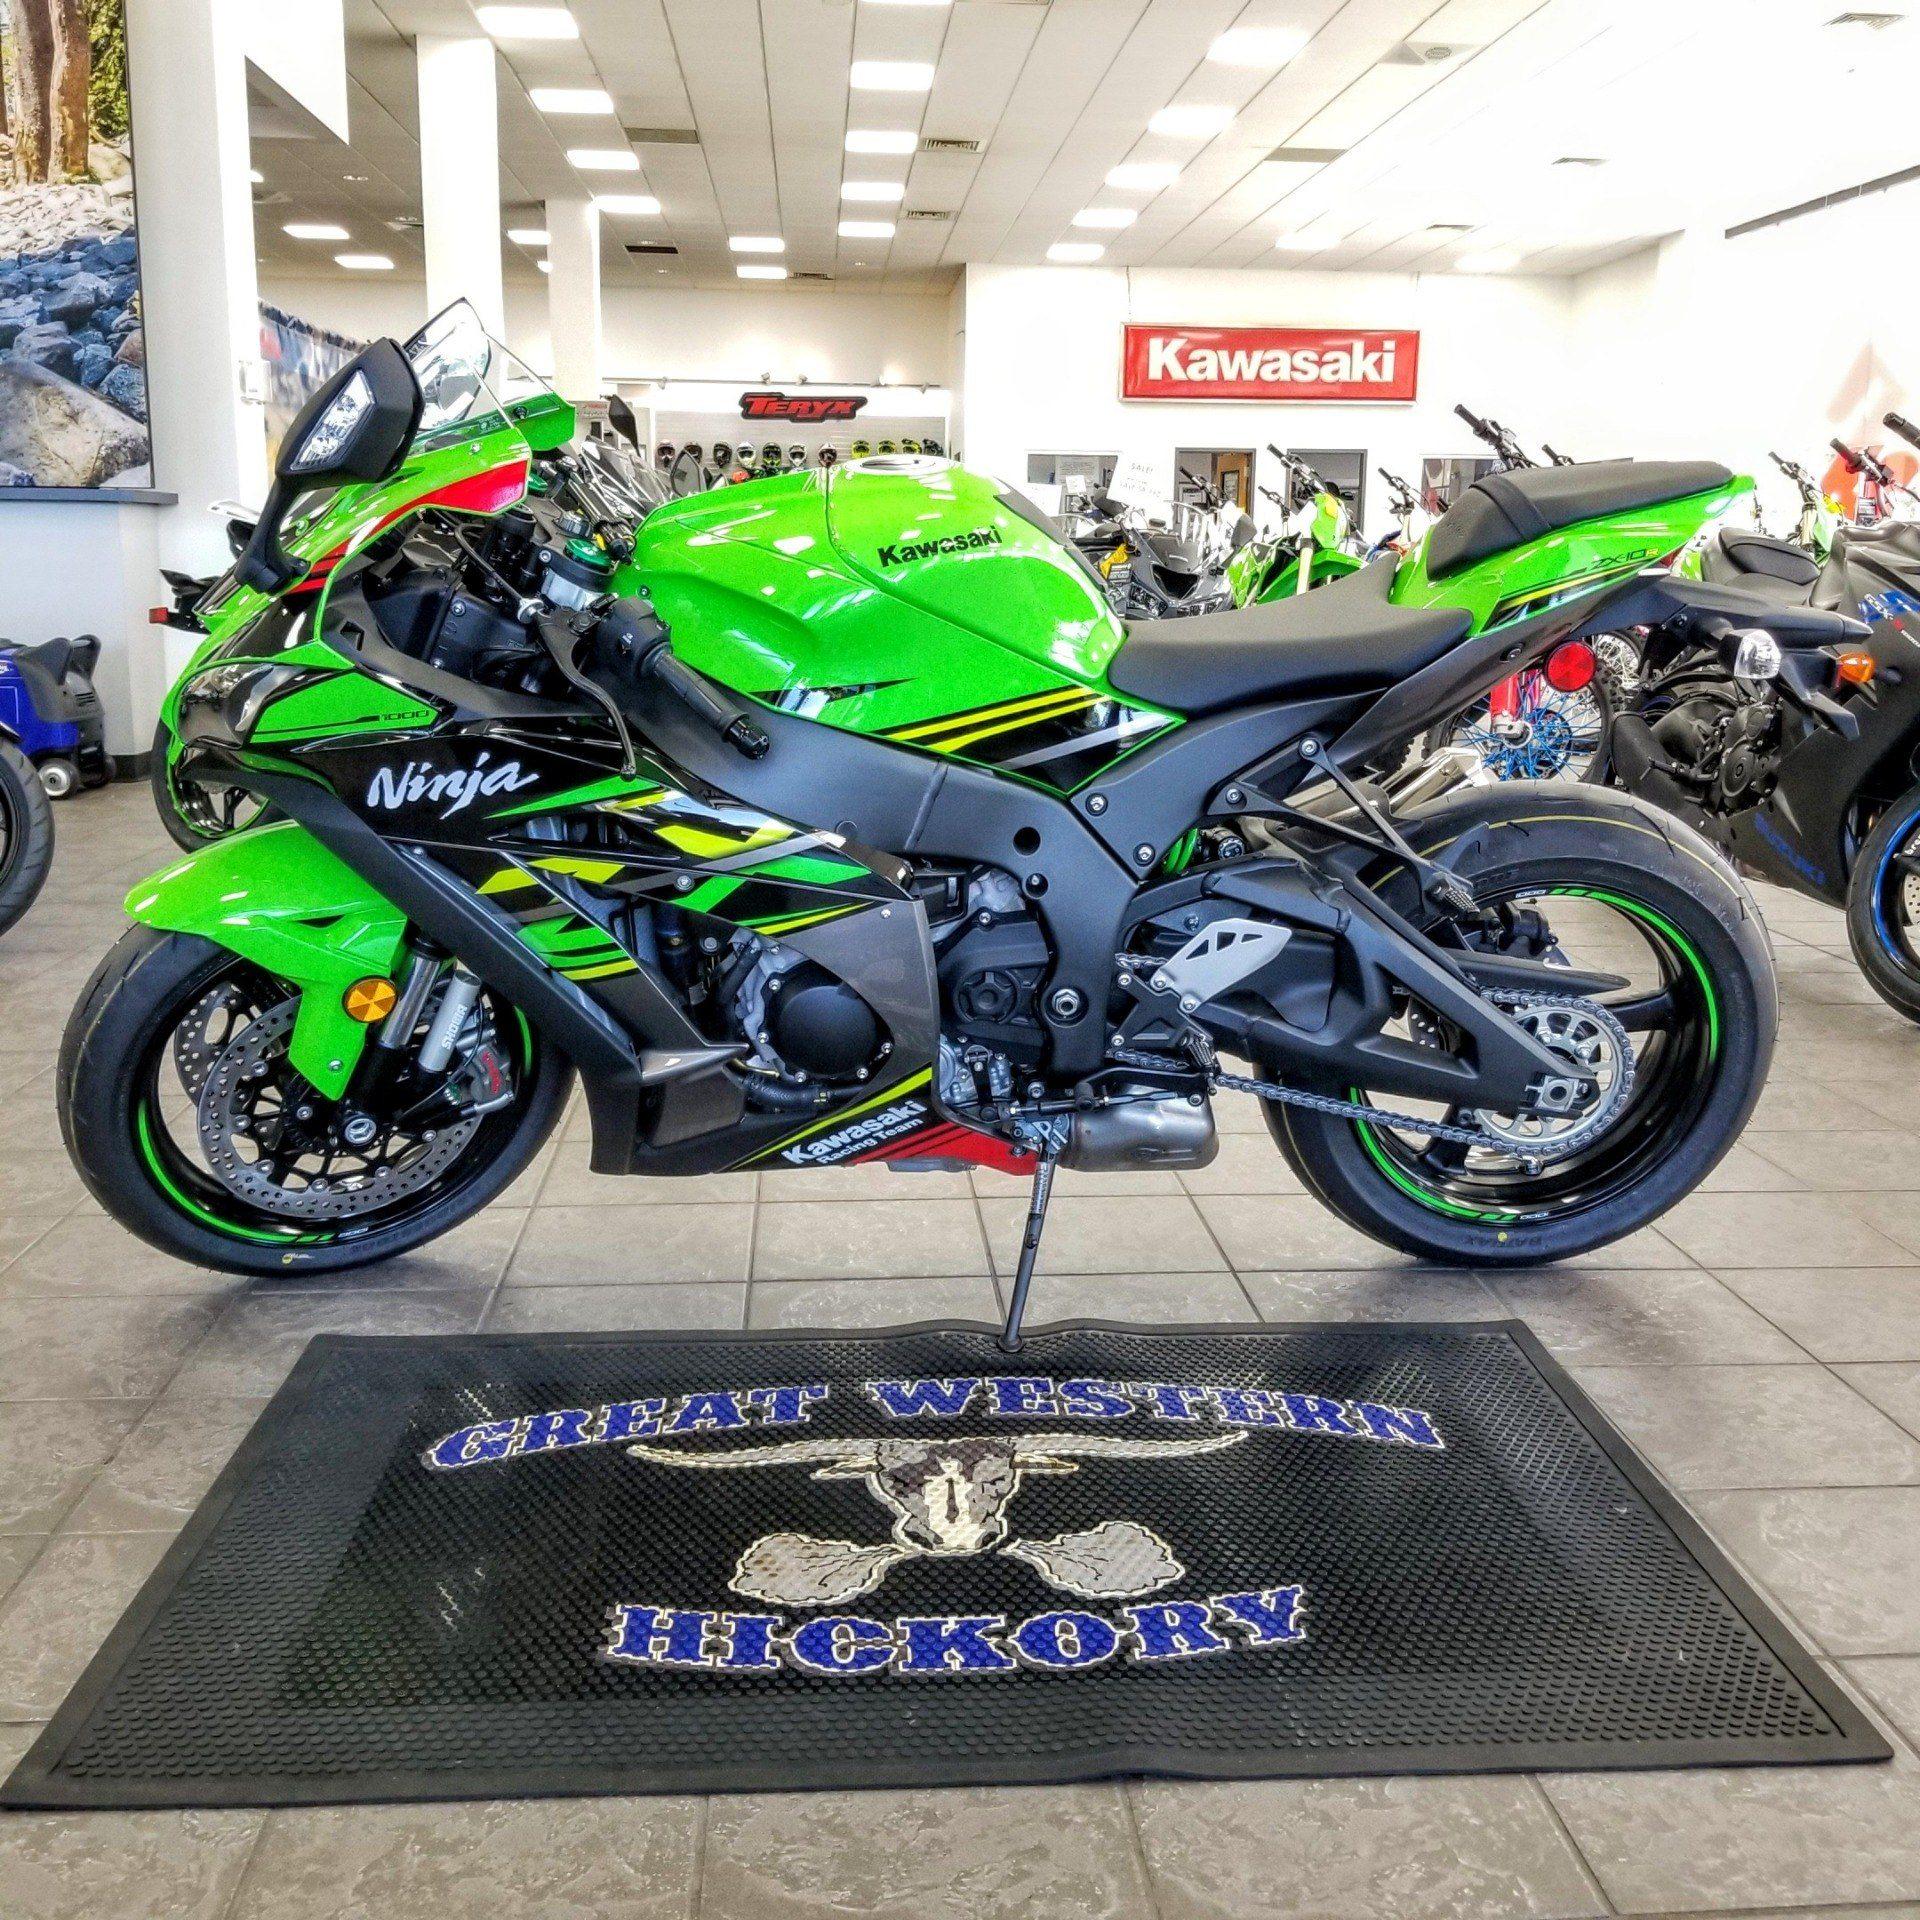 2019 Kawasaki Ninja Zx 10r Abs Krt Edition In Hickory North Carolina